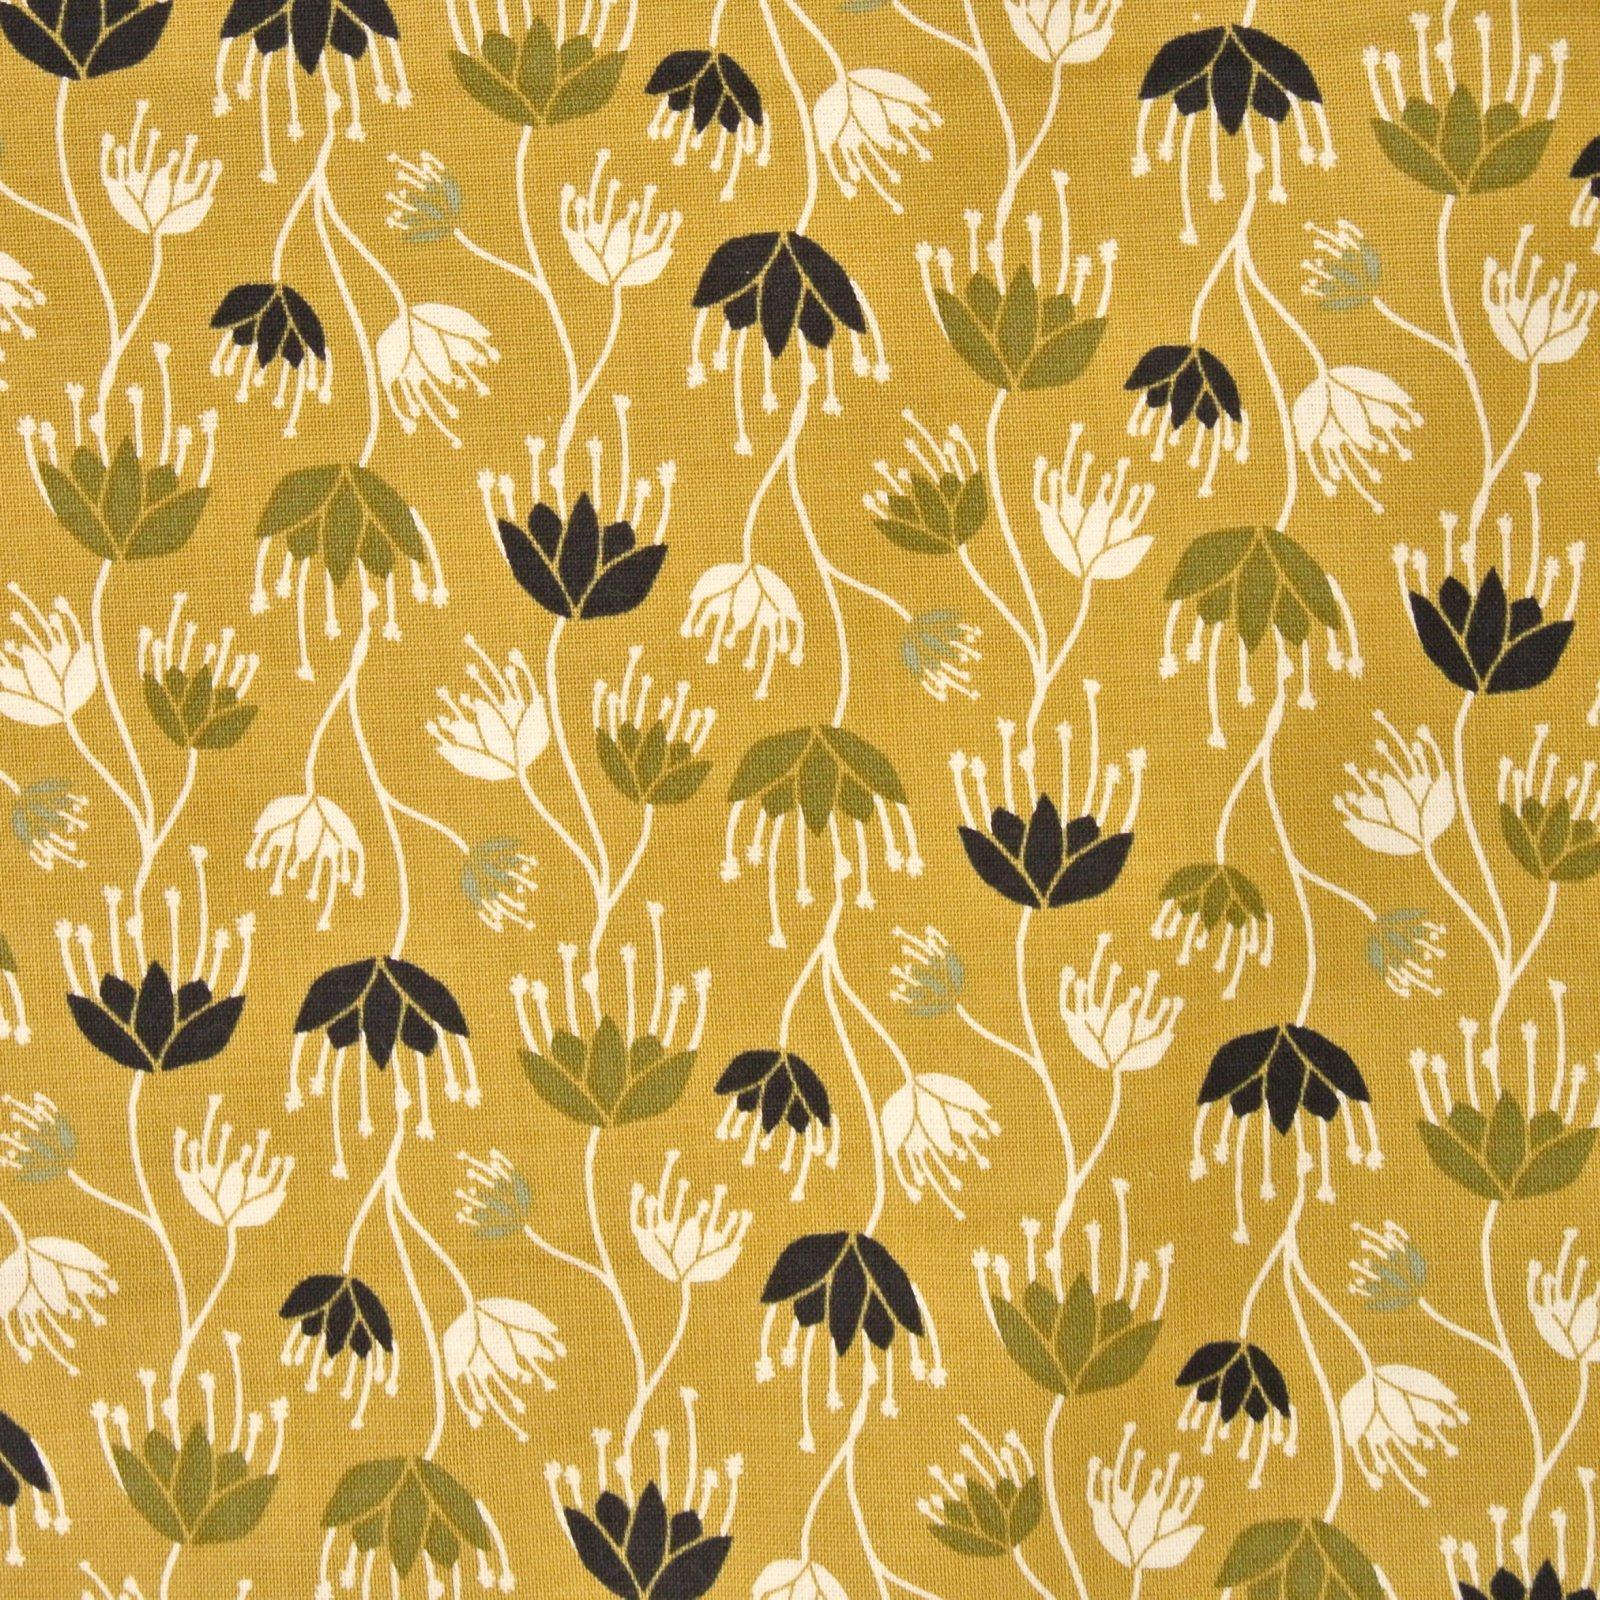 Camp Creek Riverbank Golden Hour Fabric